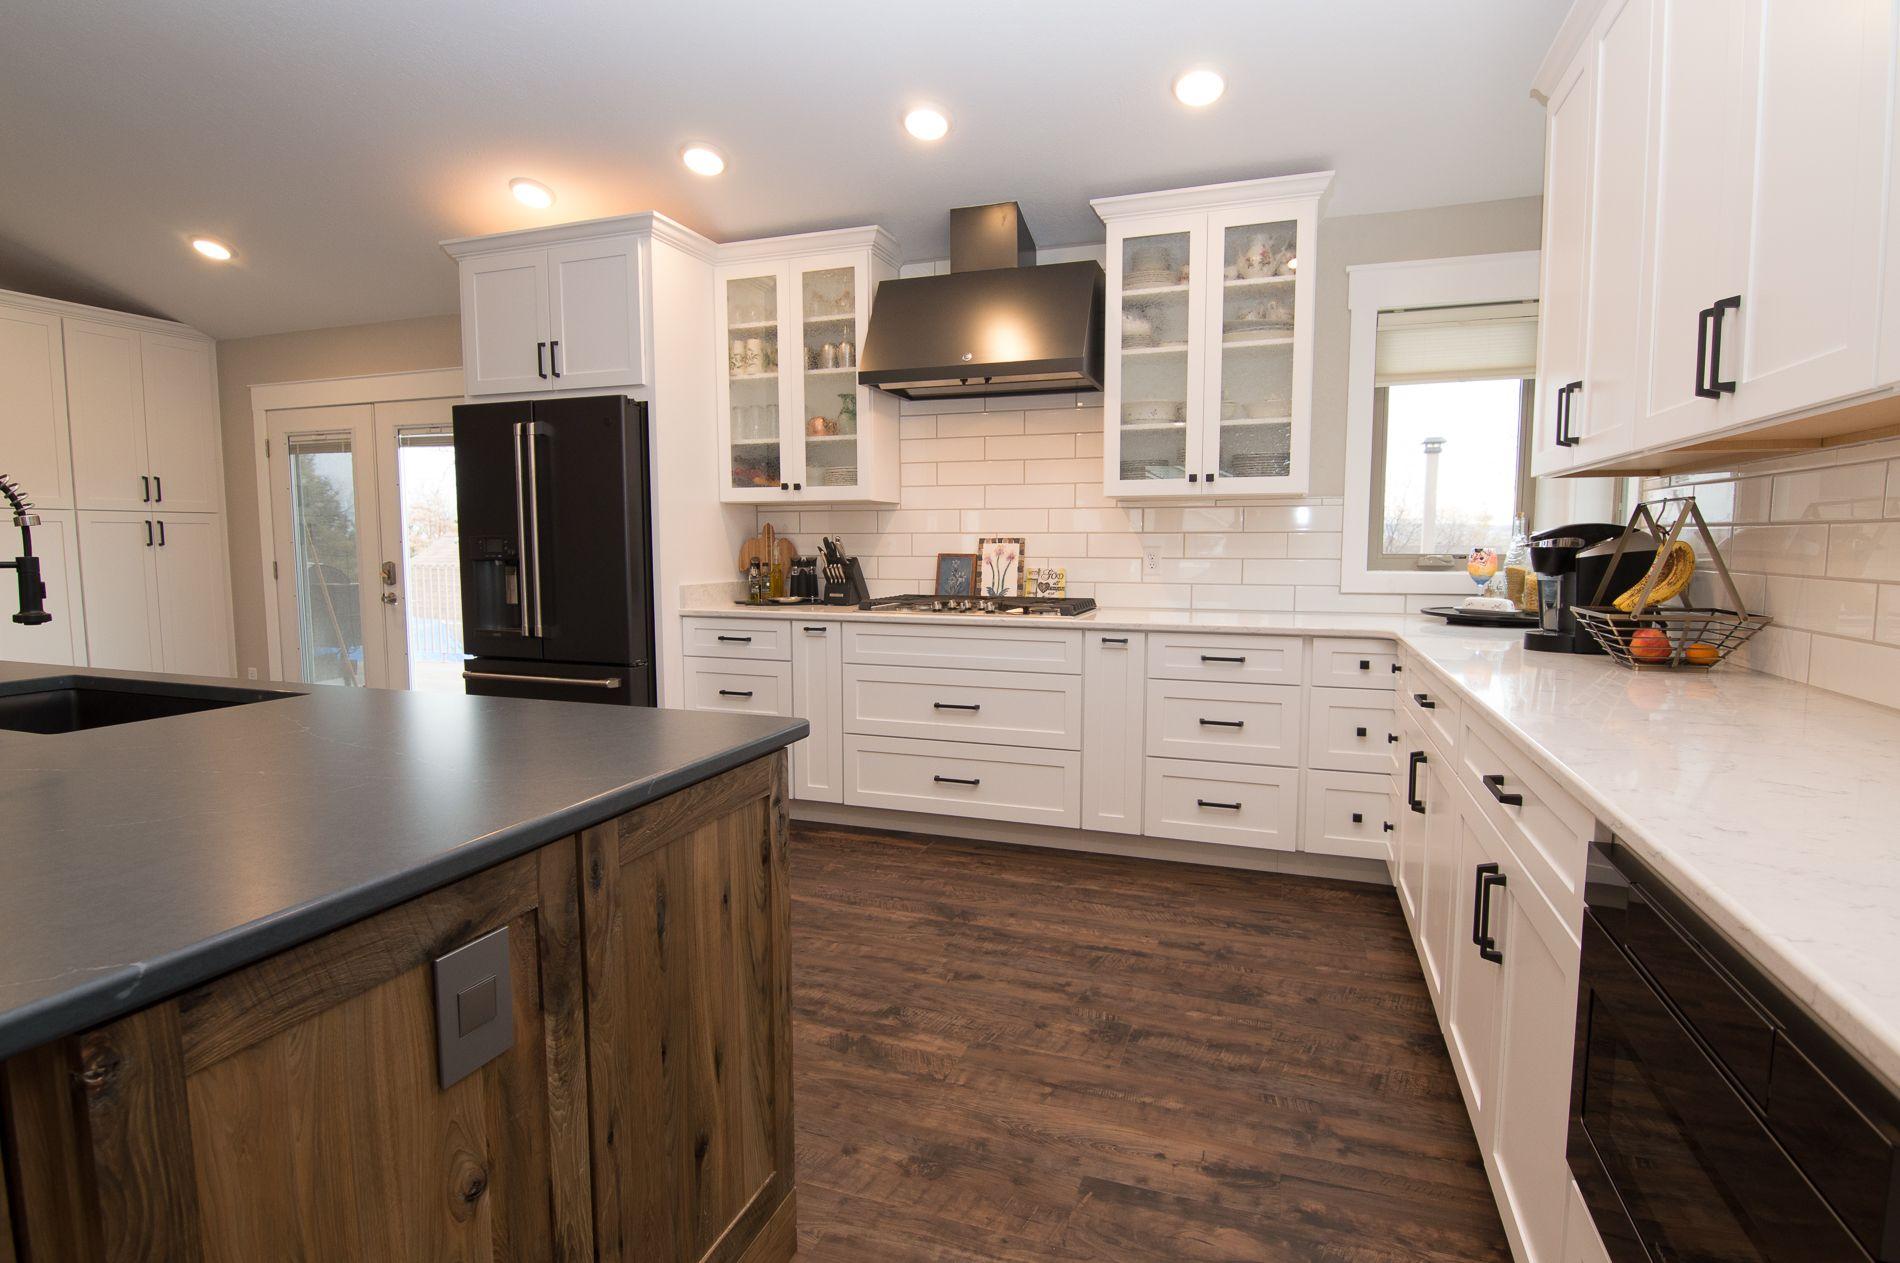 White Maple Kitchen Shakercabinets Whitekitchen Beyondthebox Billings Montana Cool Kitchens Design Kitchen And Bath